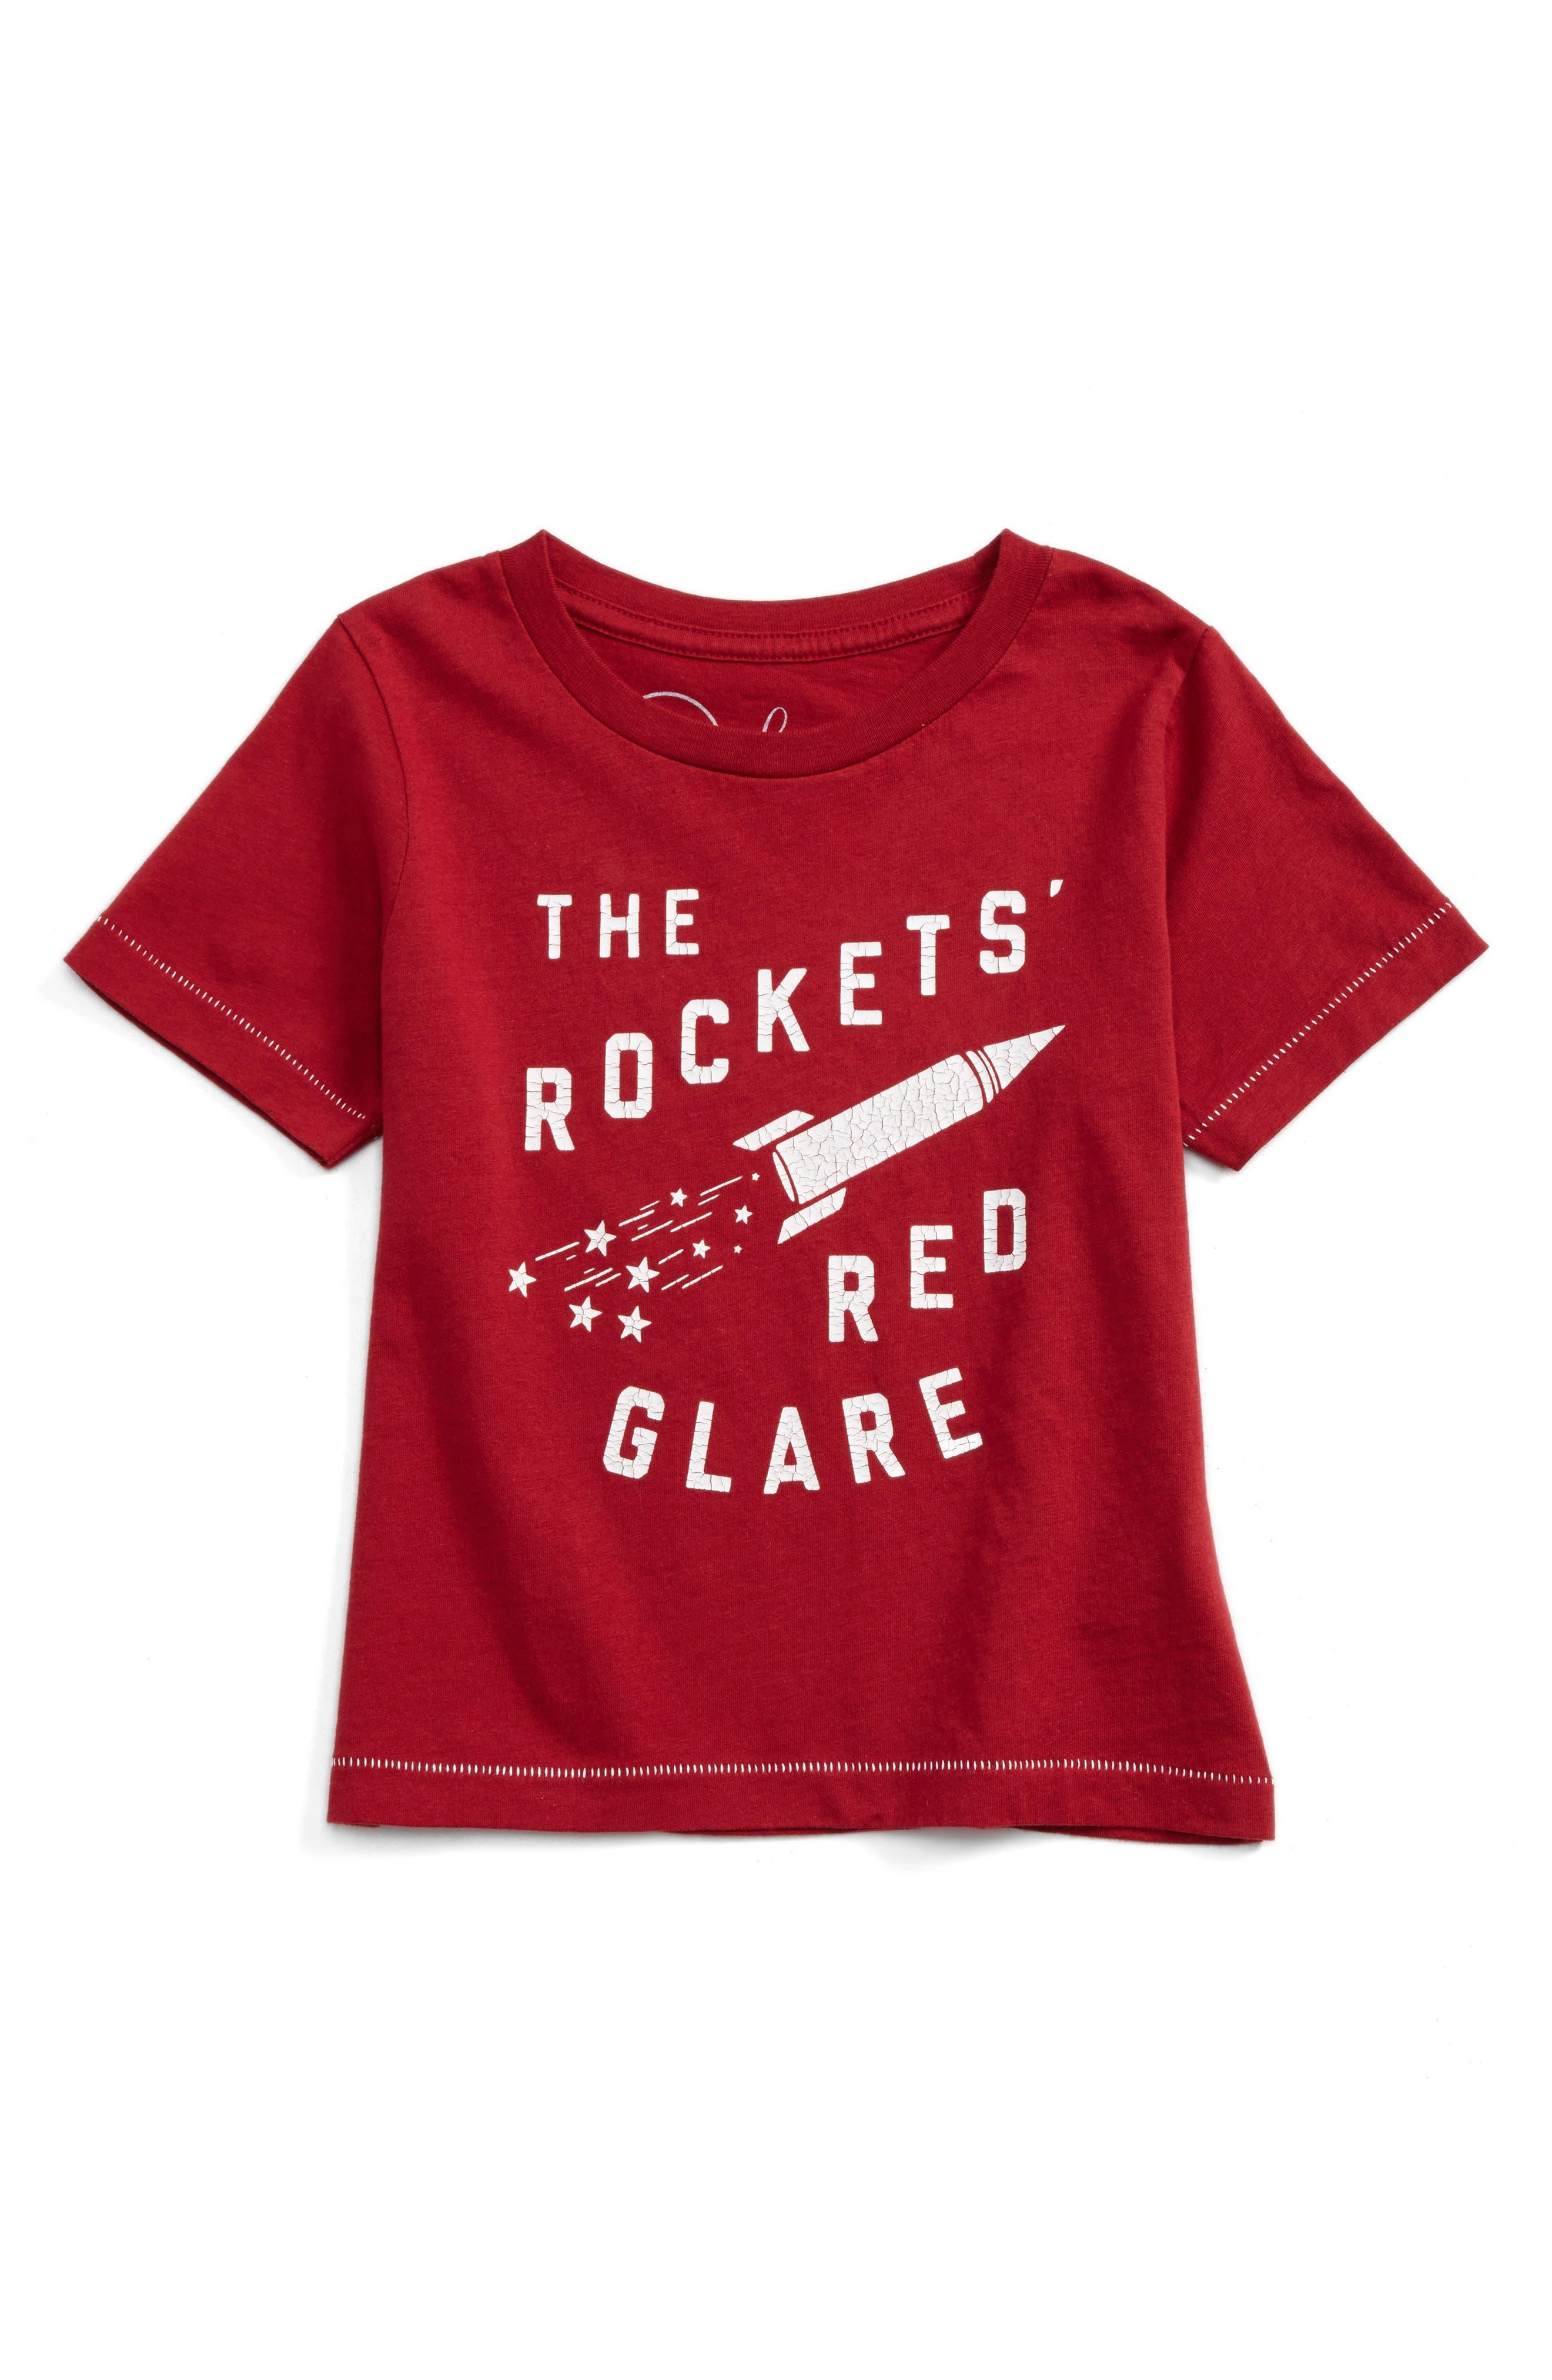 Alternate Image 1 Selected - Peek Rockets' Red Glare T-Shirt (Toddler Boys, Little Boys & Big Boys)